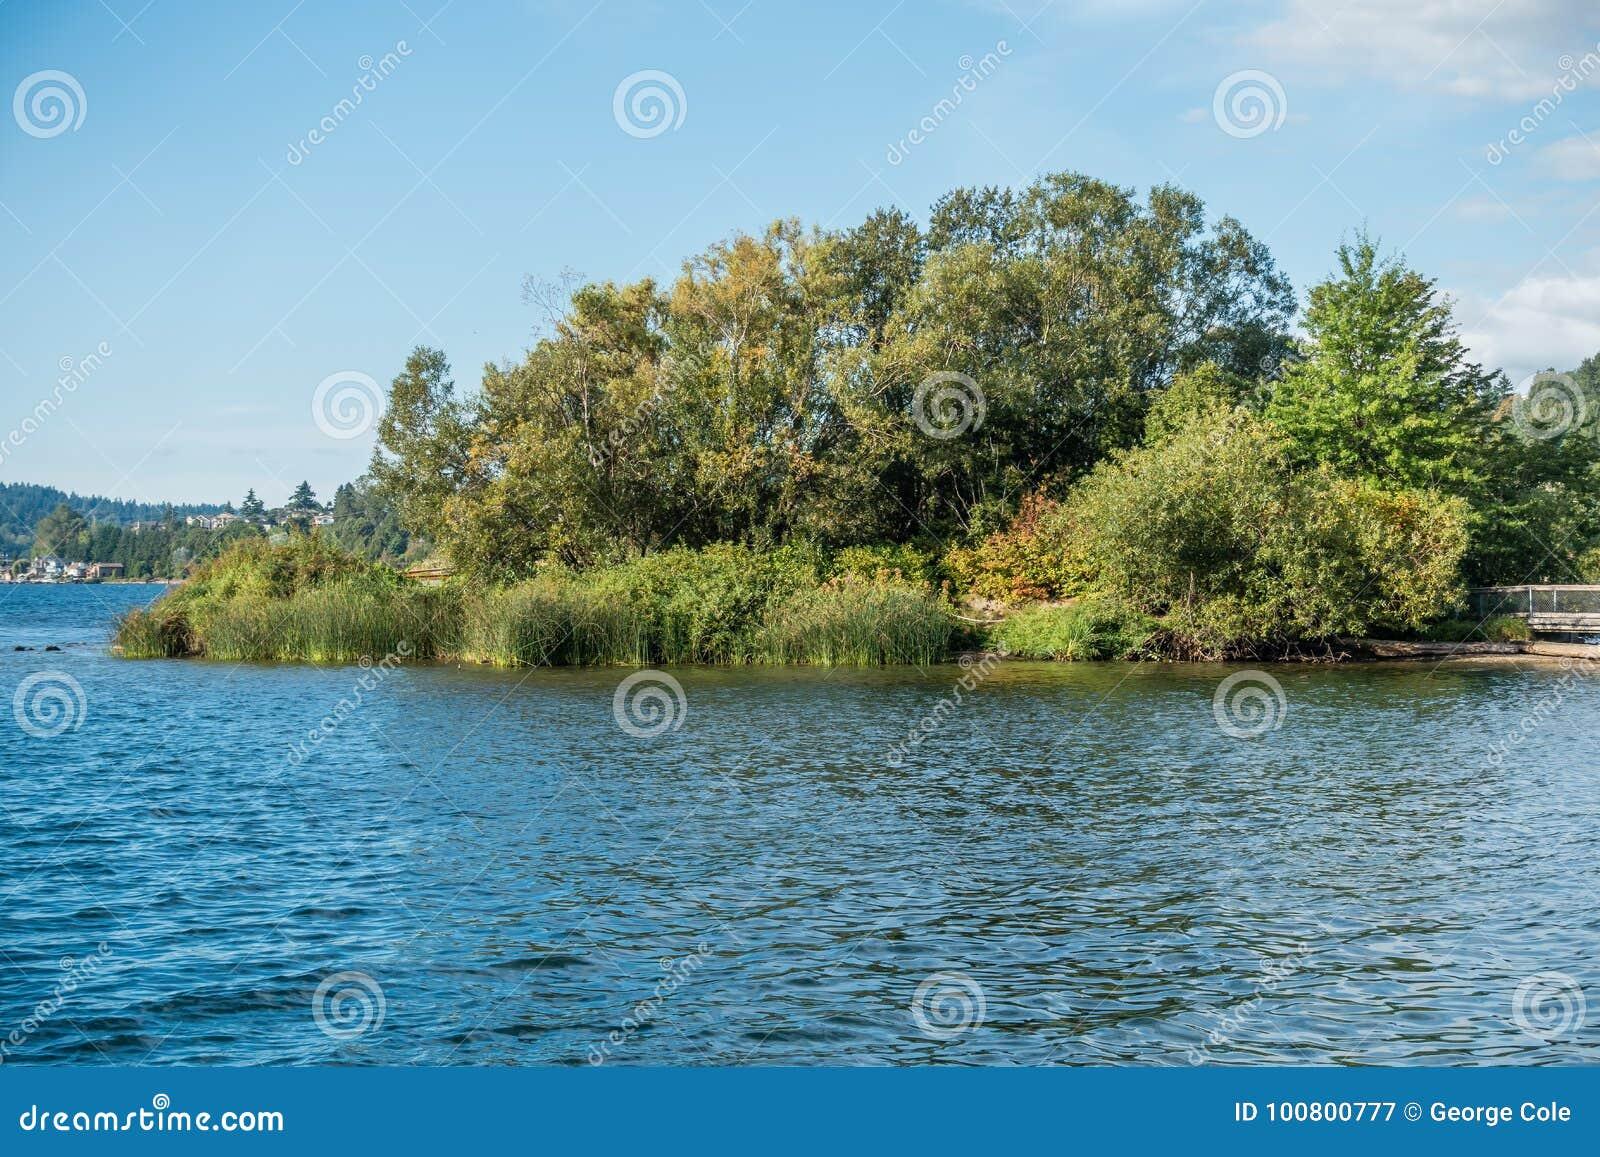 Gene Coulon Park Island 3